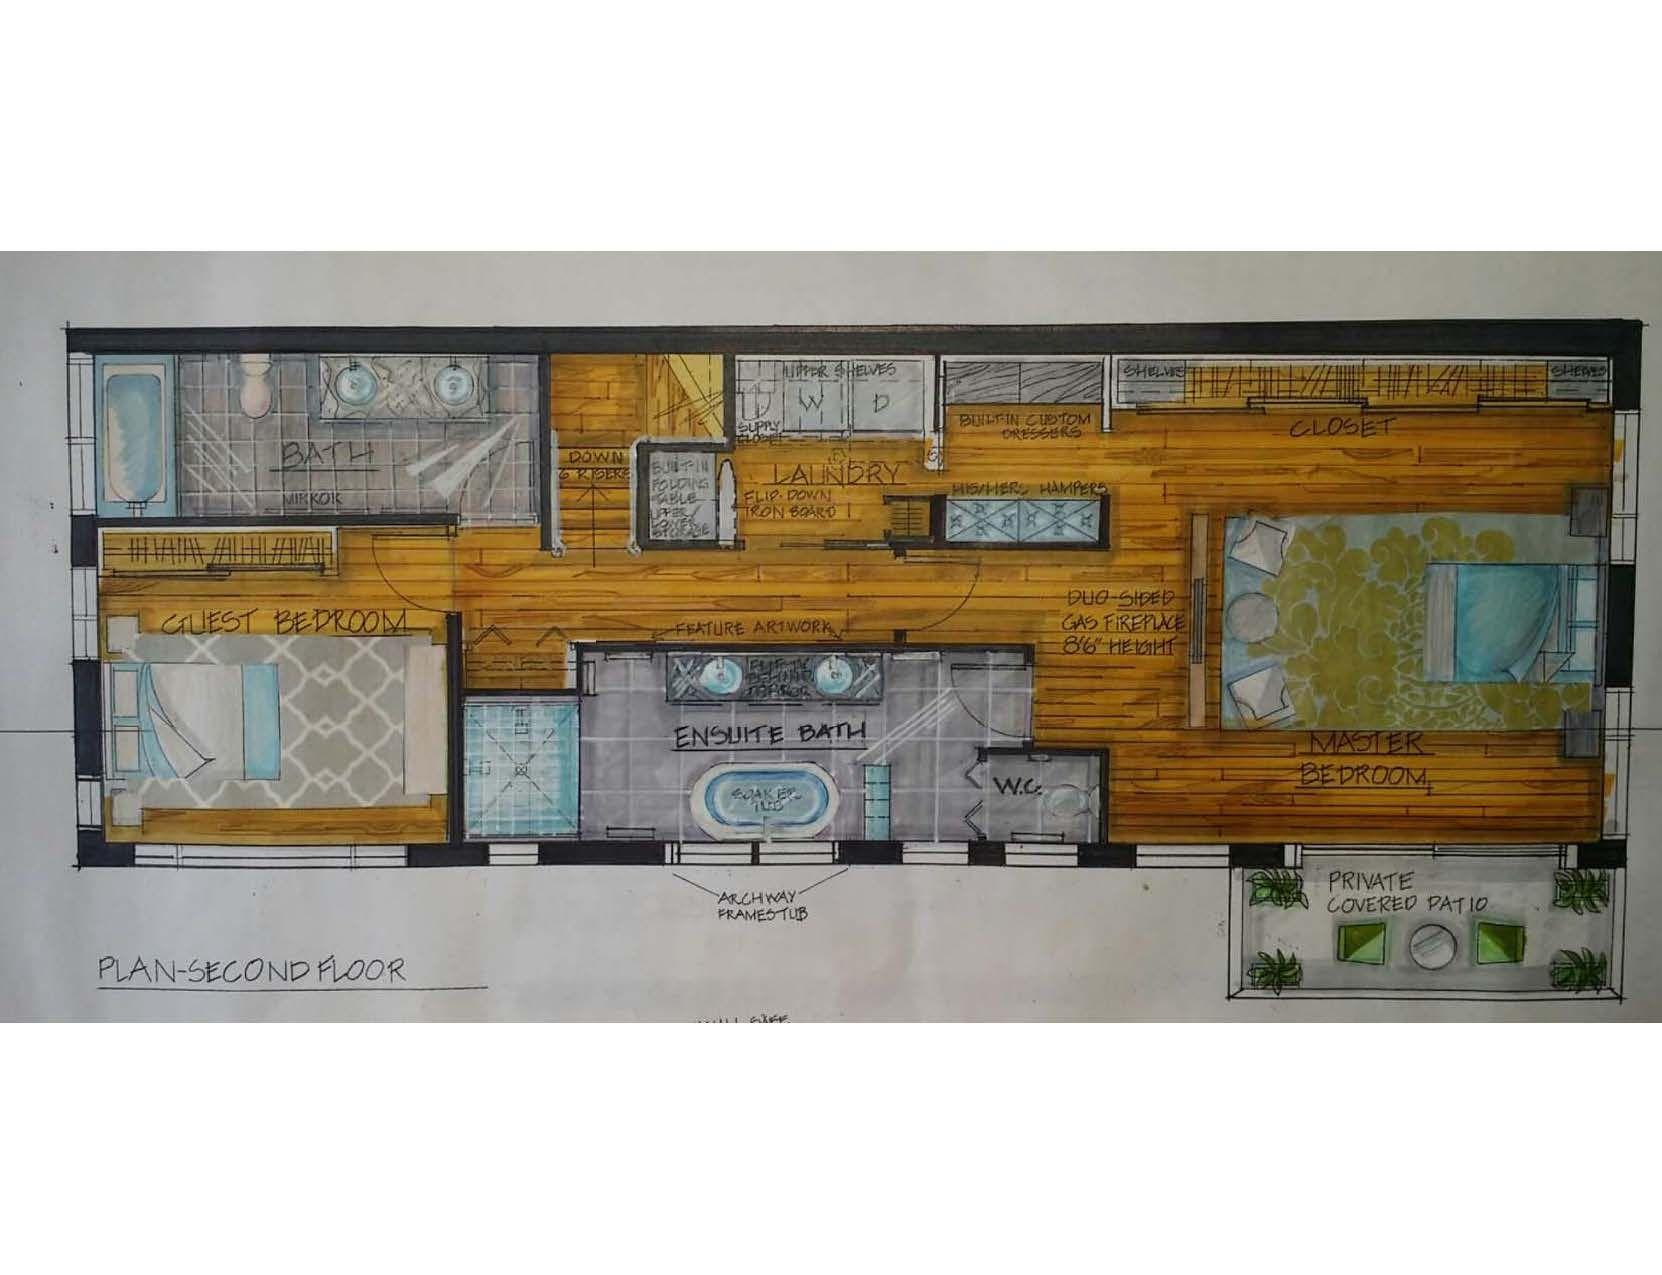 2nd floor townhouse floorplan fully hand rendered